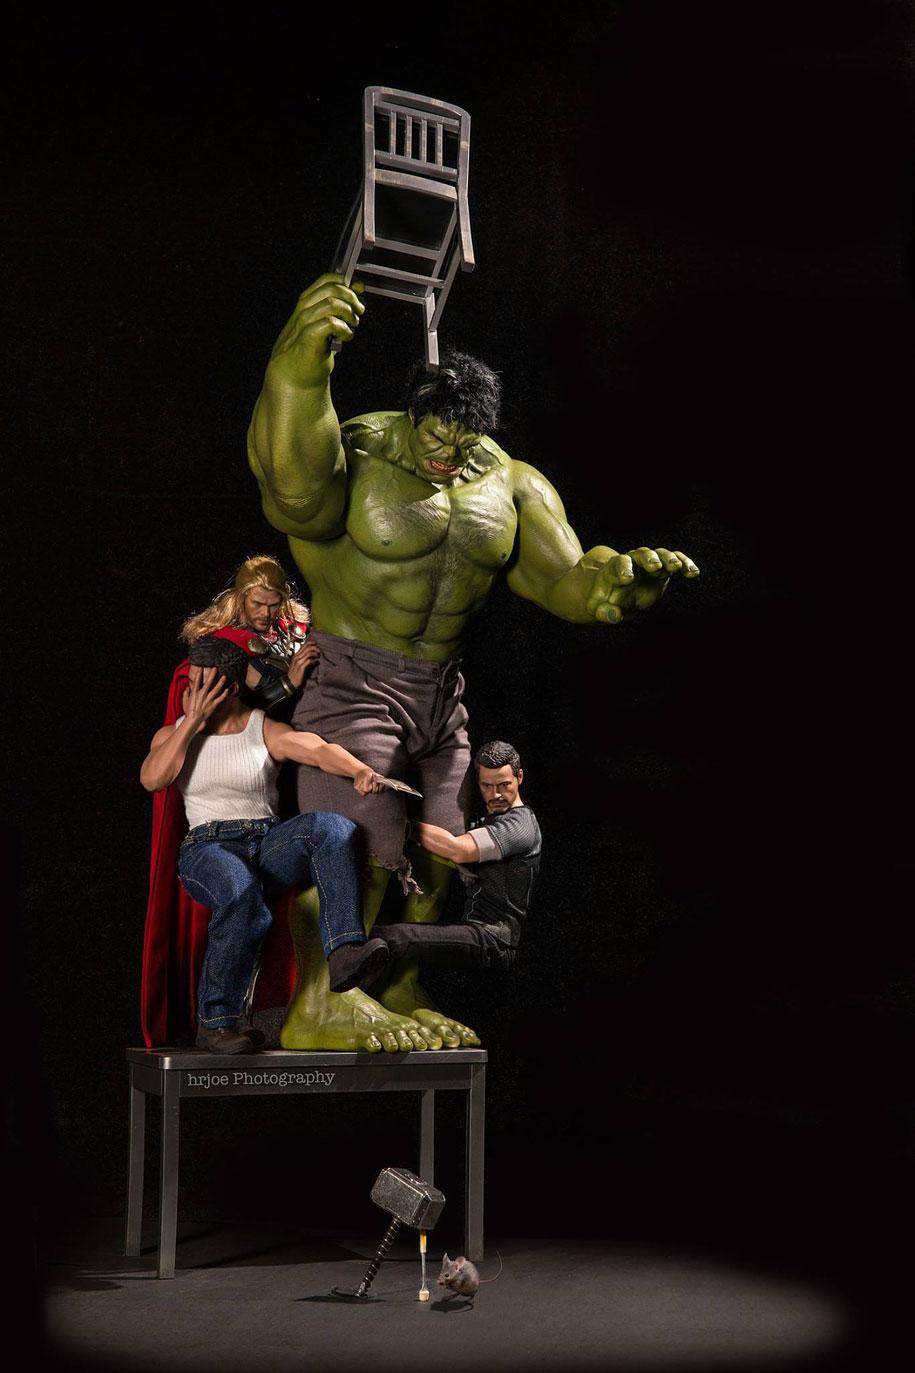 giocattoli-figure-pupazzi-supereroi-foto-divertenti-hrjoe-22